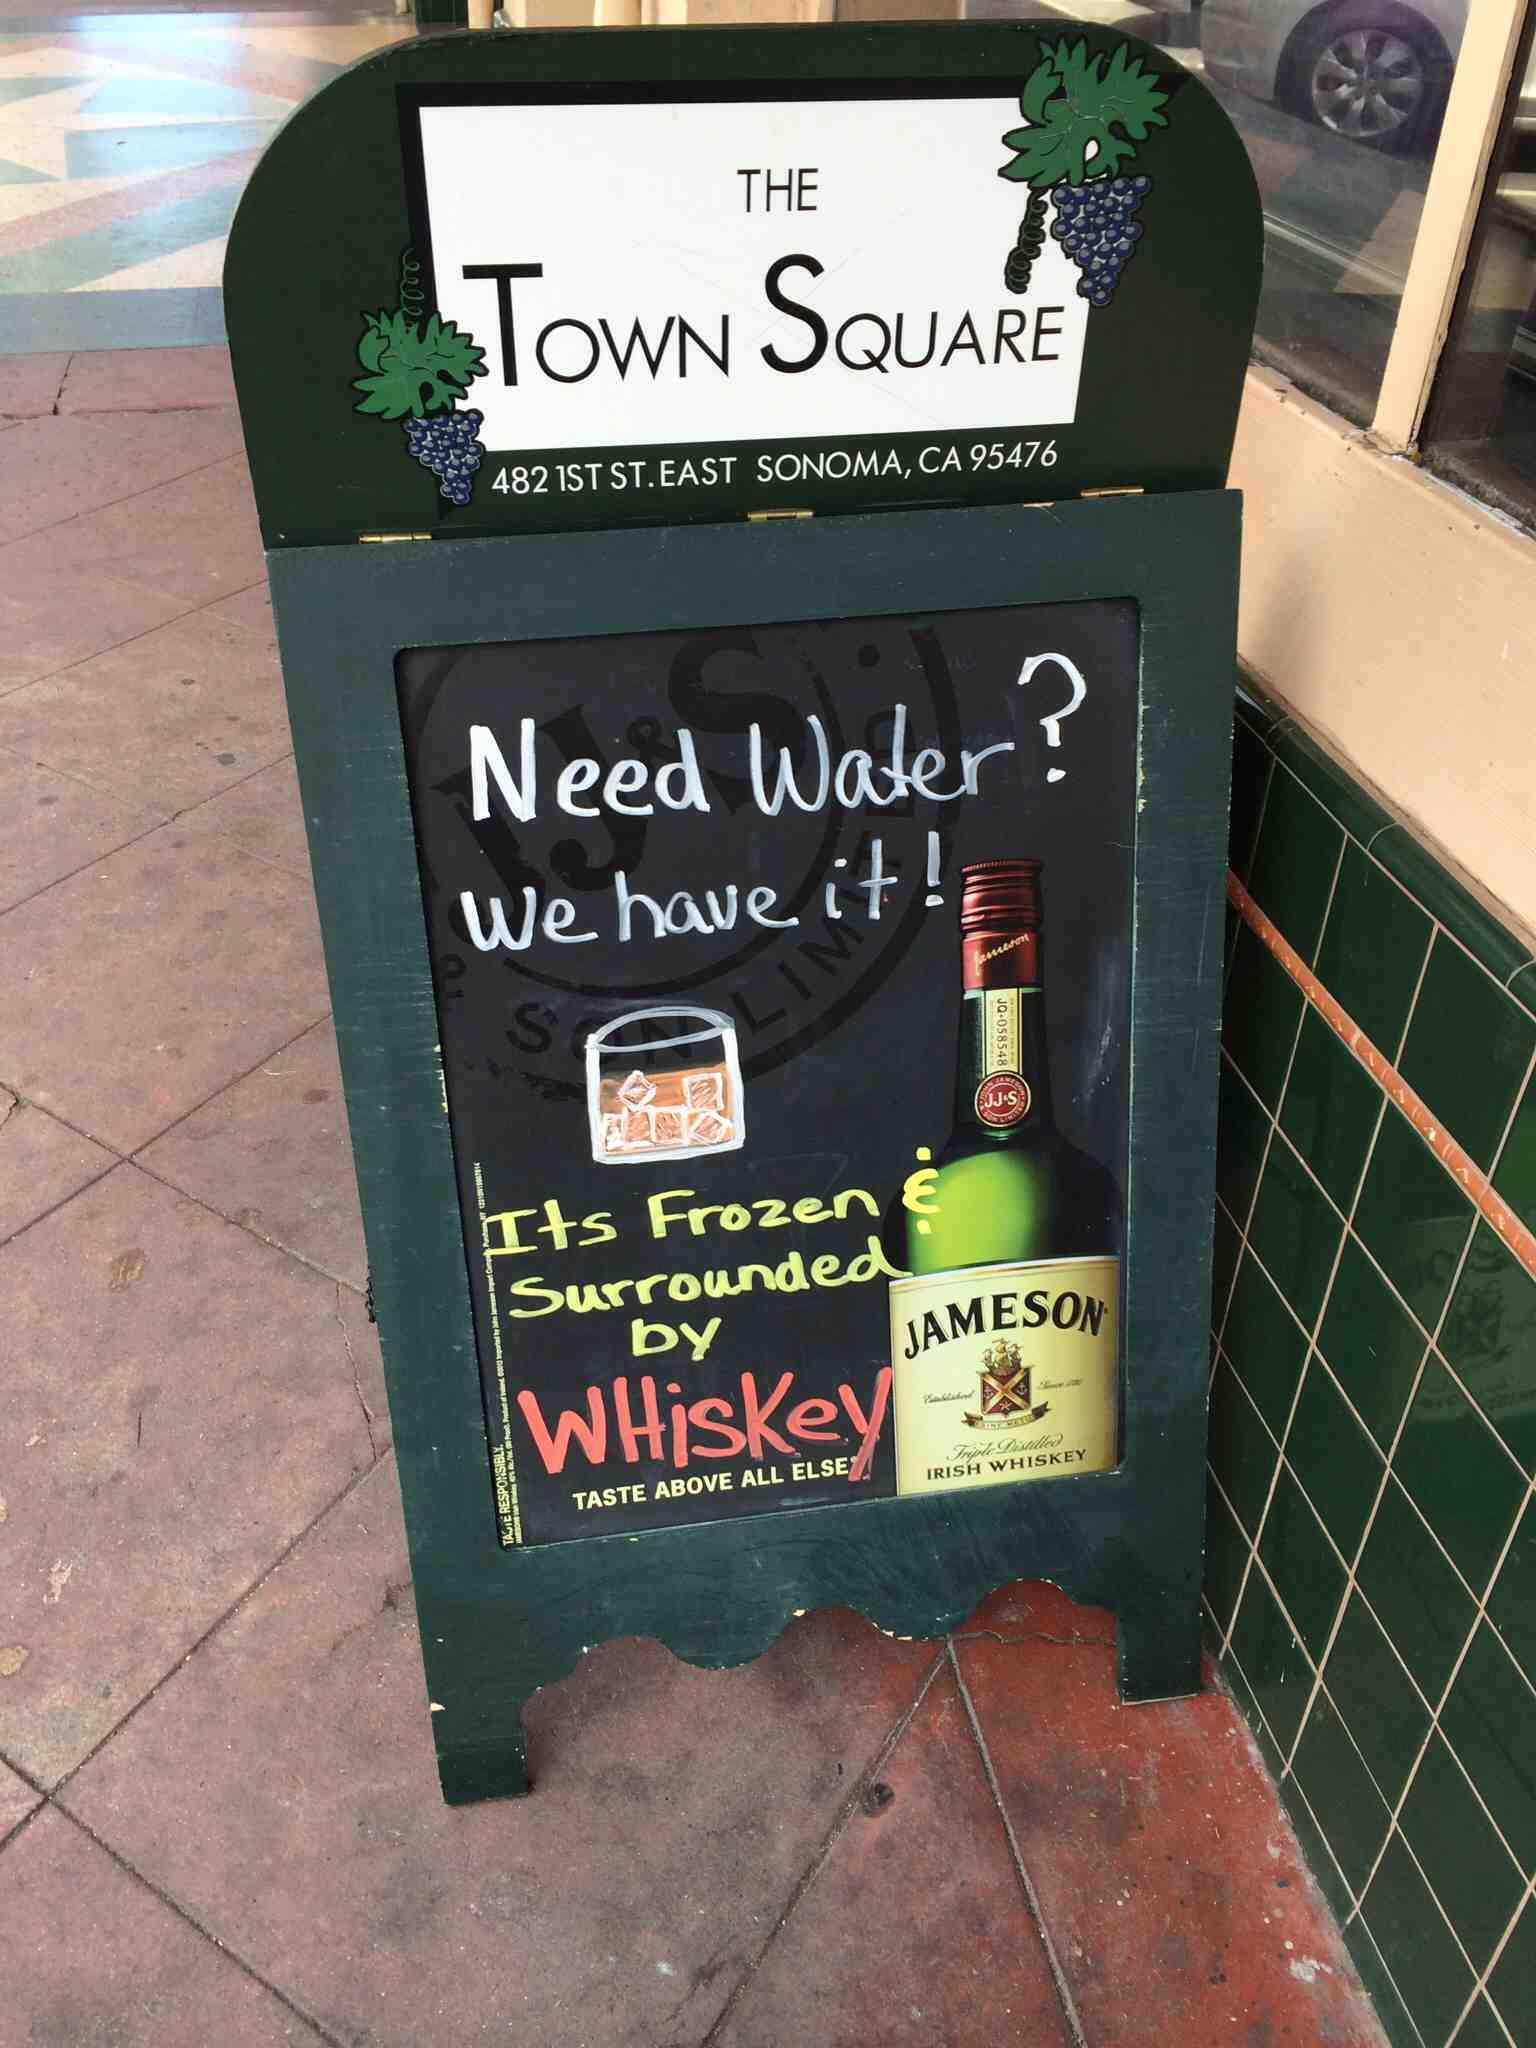 Фото: Хотите воды? У нас есть! Она заморожена и окружена виски.